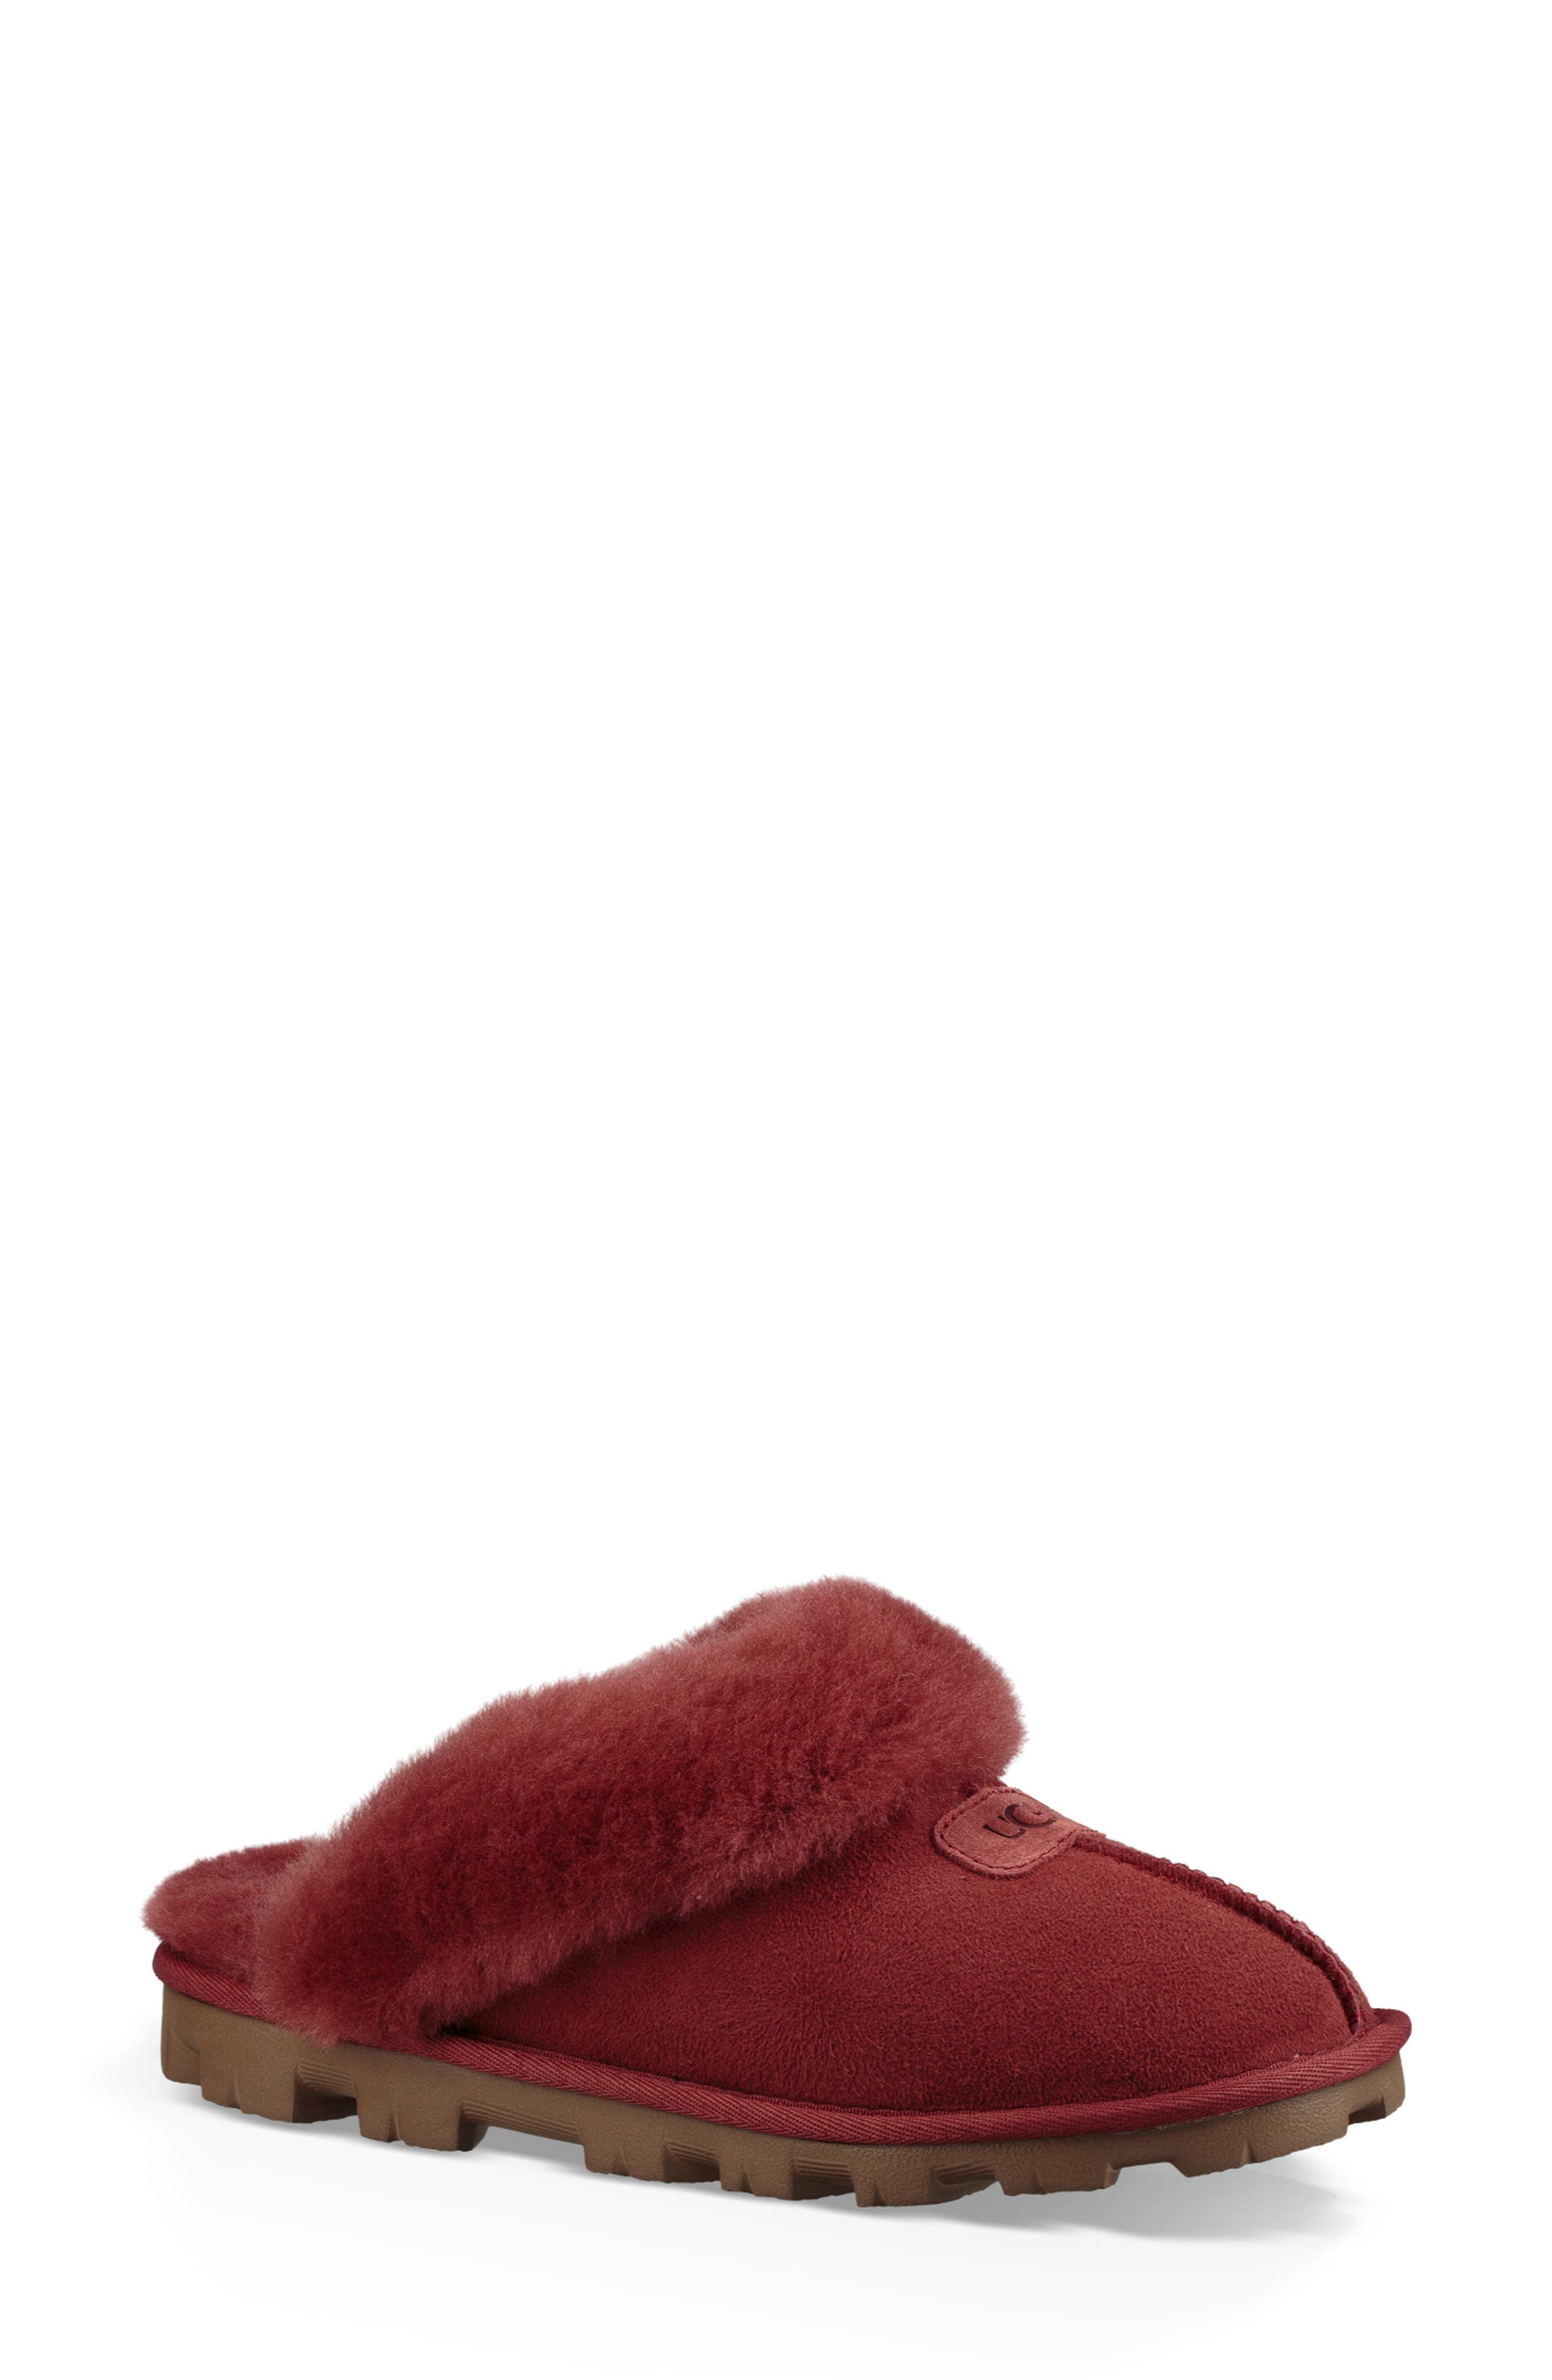 Ugg Genuine Shearling Slipper, Red